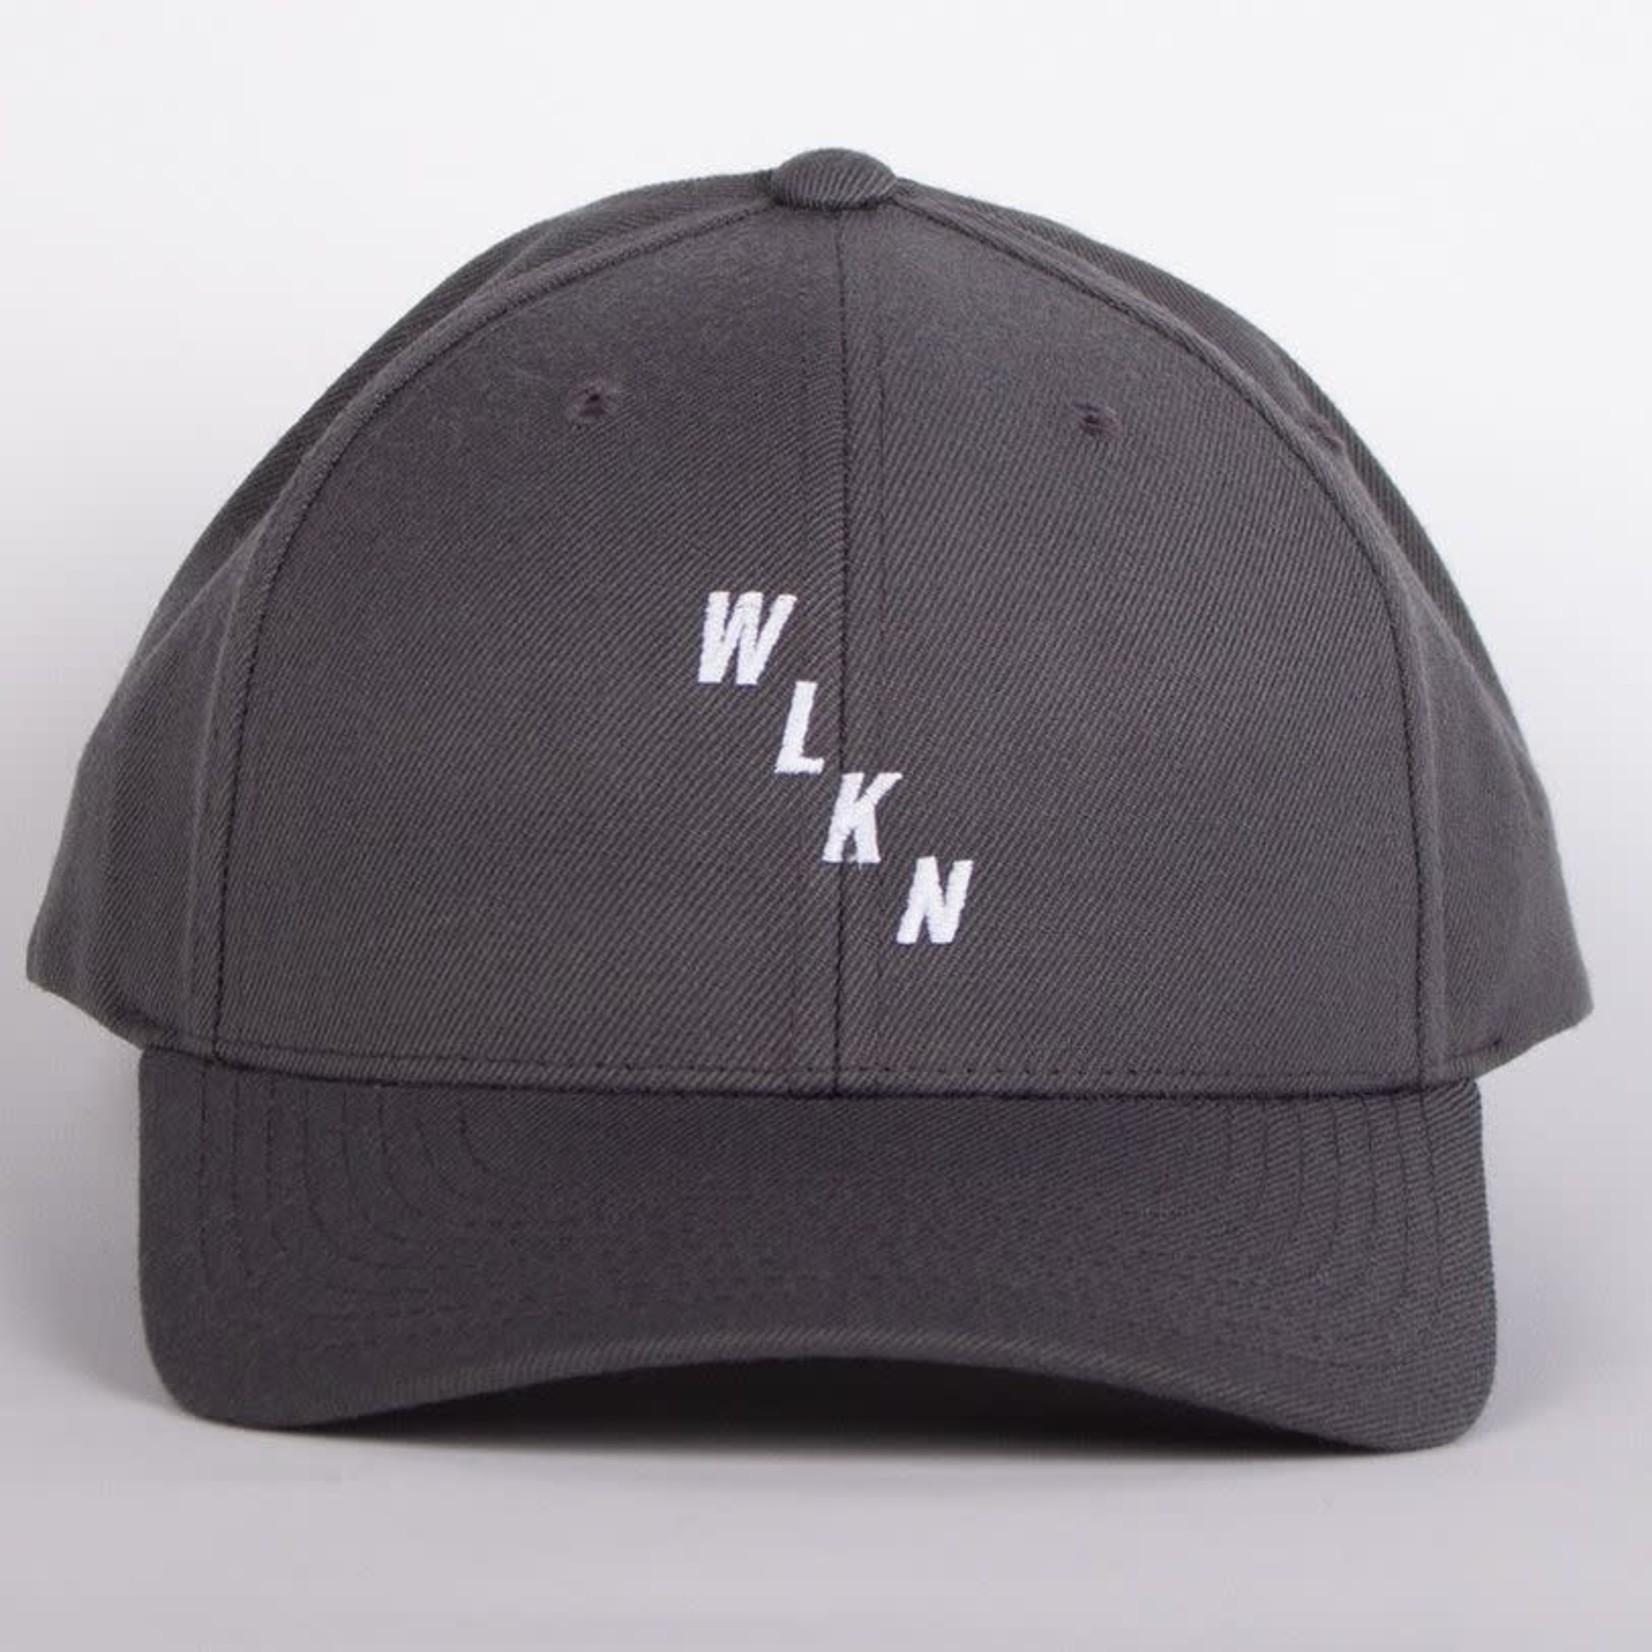 WLKN WLKN : Stair Baseball Cap